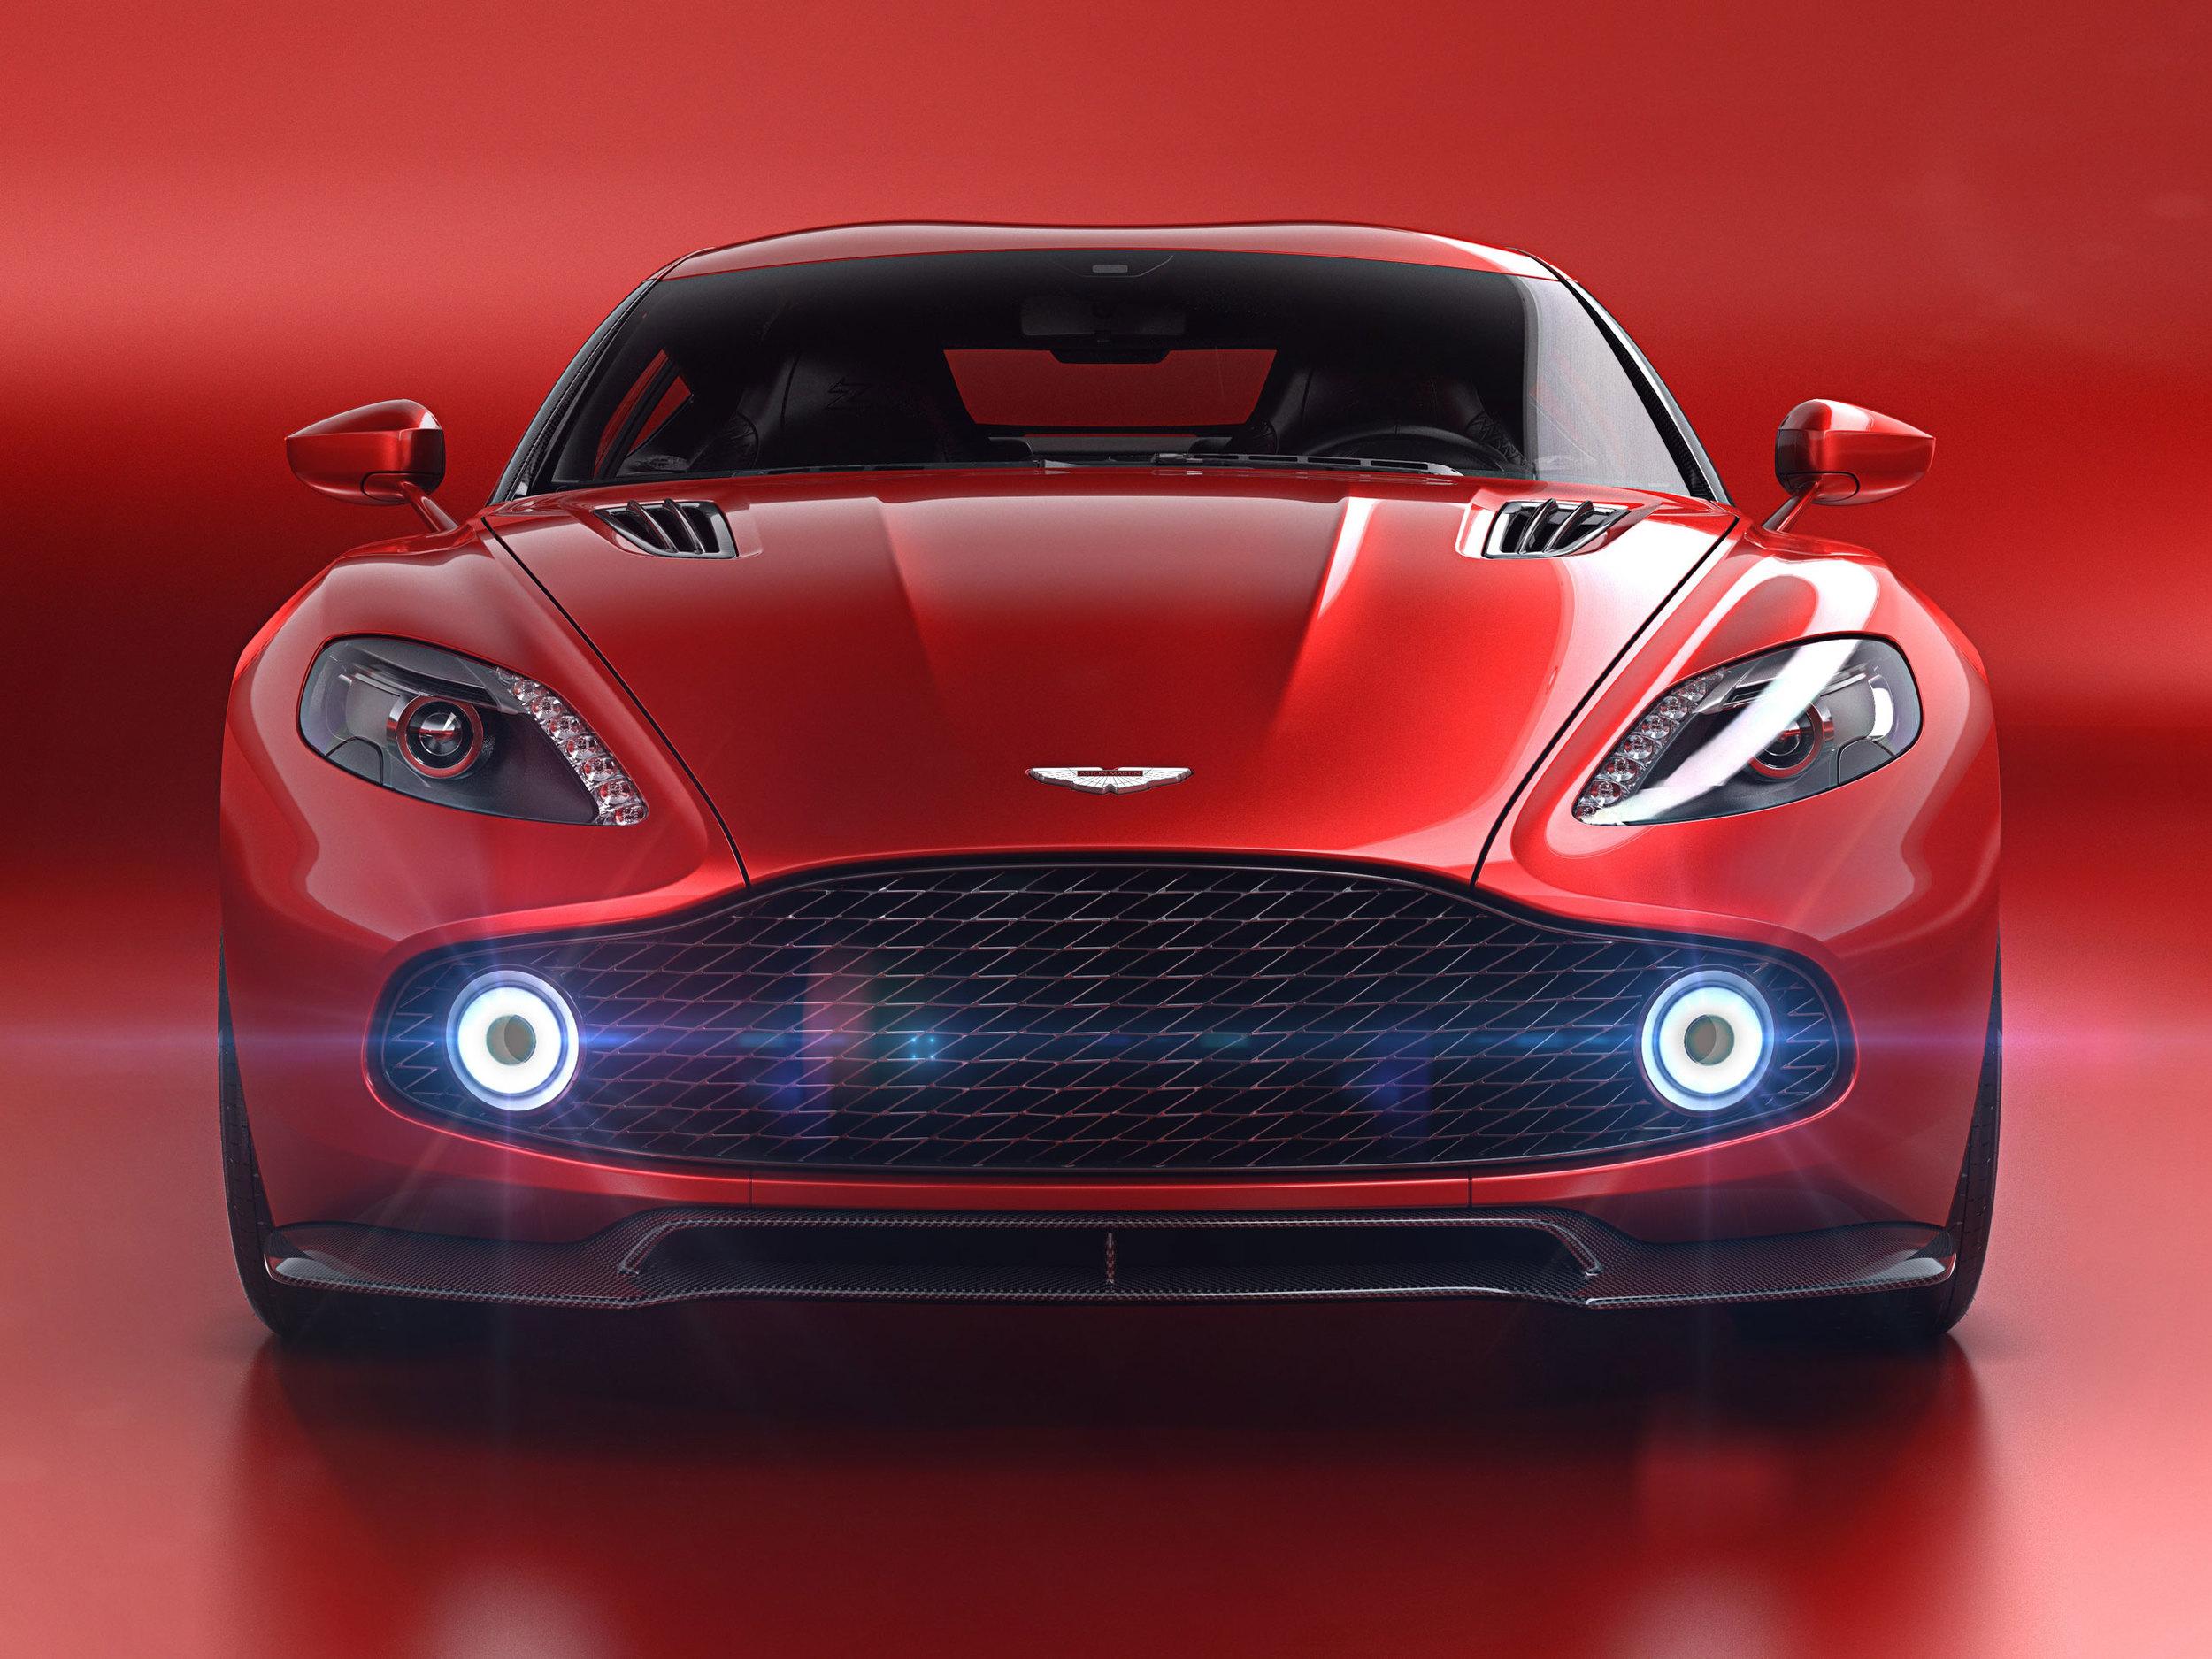 Aston-Martin-Vanquish-Zagato-Concept_02.jpg